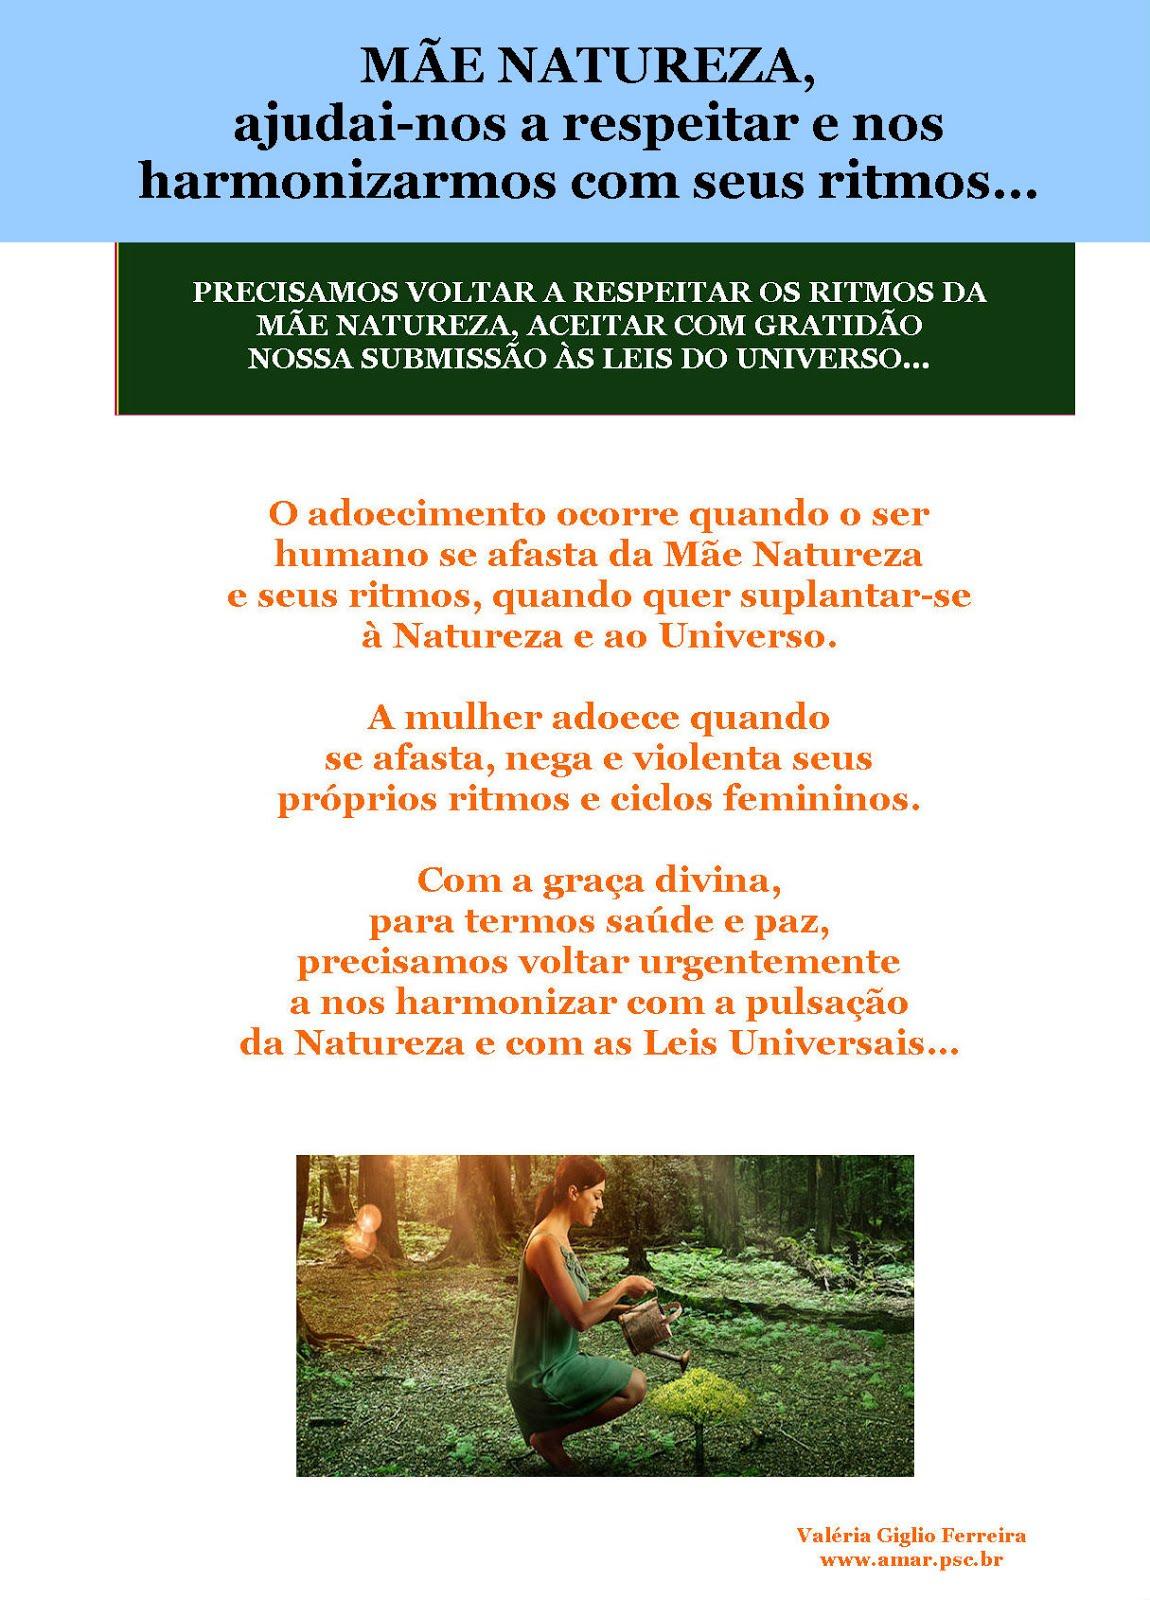 Respeitar a Mãe Natureza...